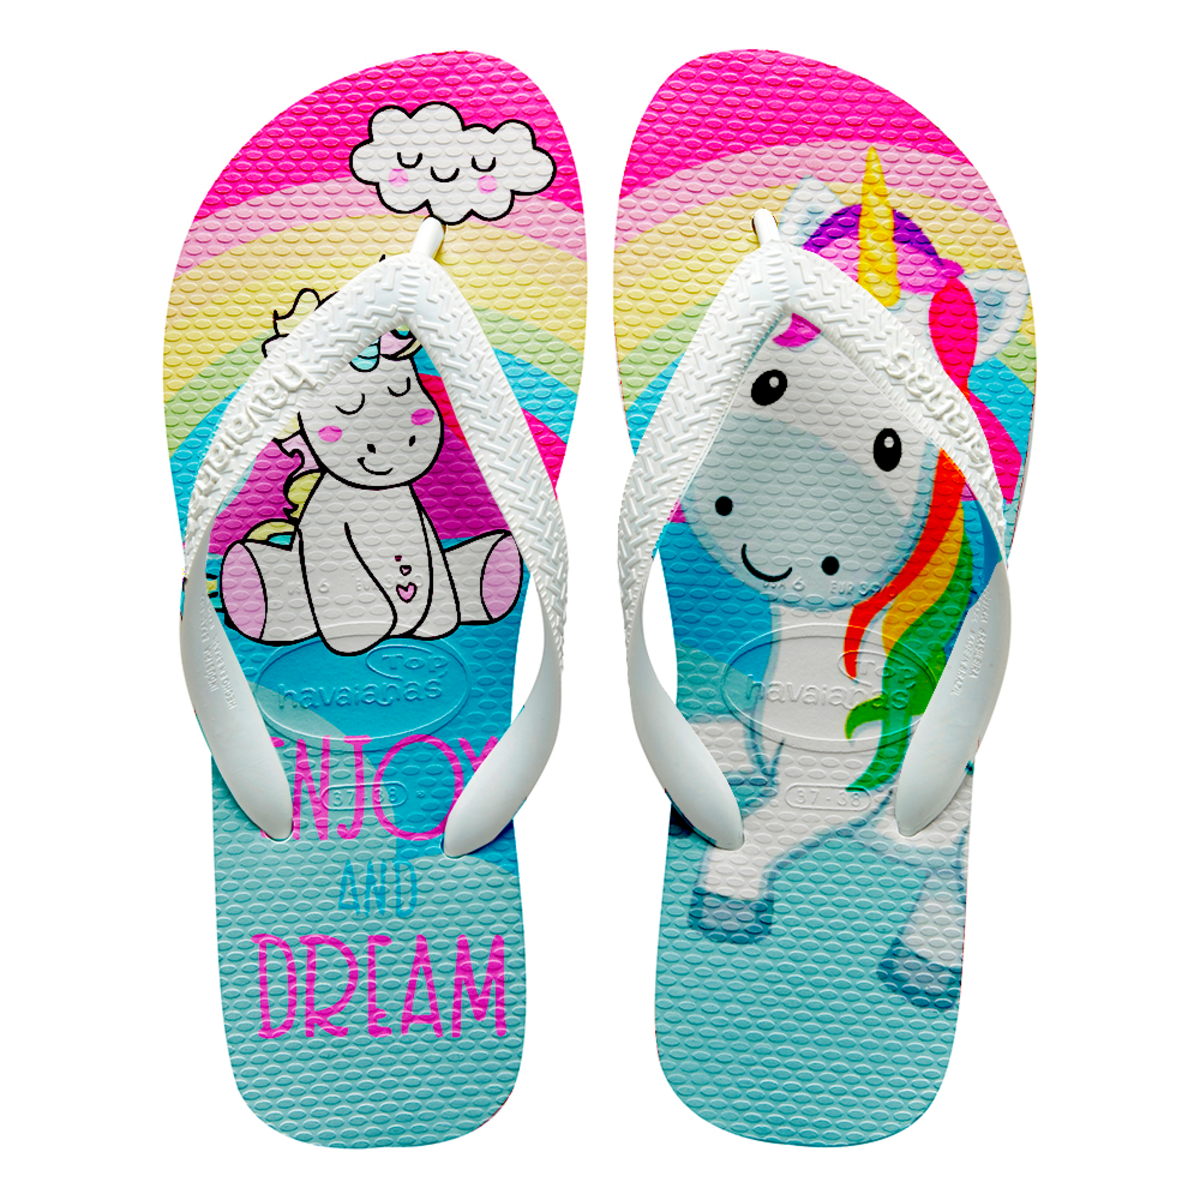 f4ca5cfdca Chinelos havaianas personalizado unicornio no Elo7